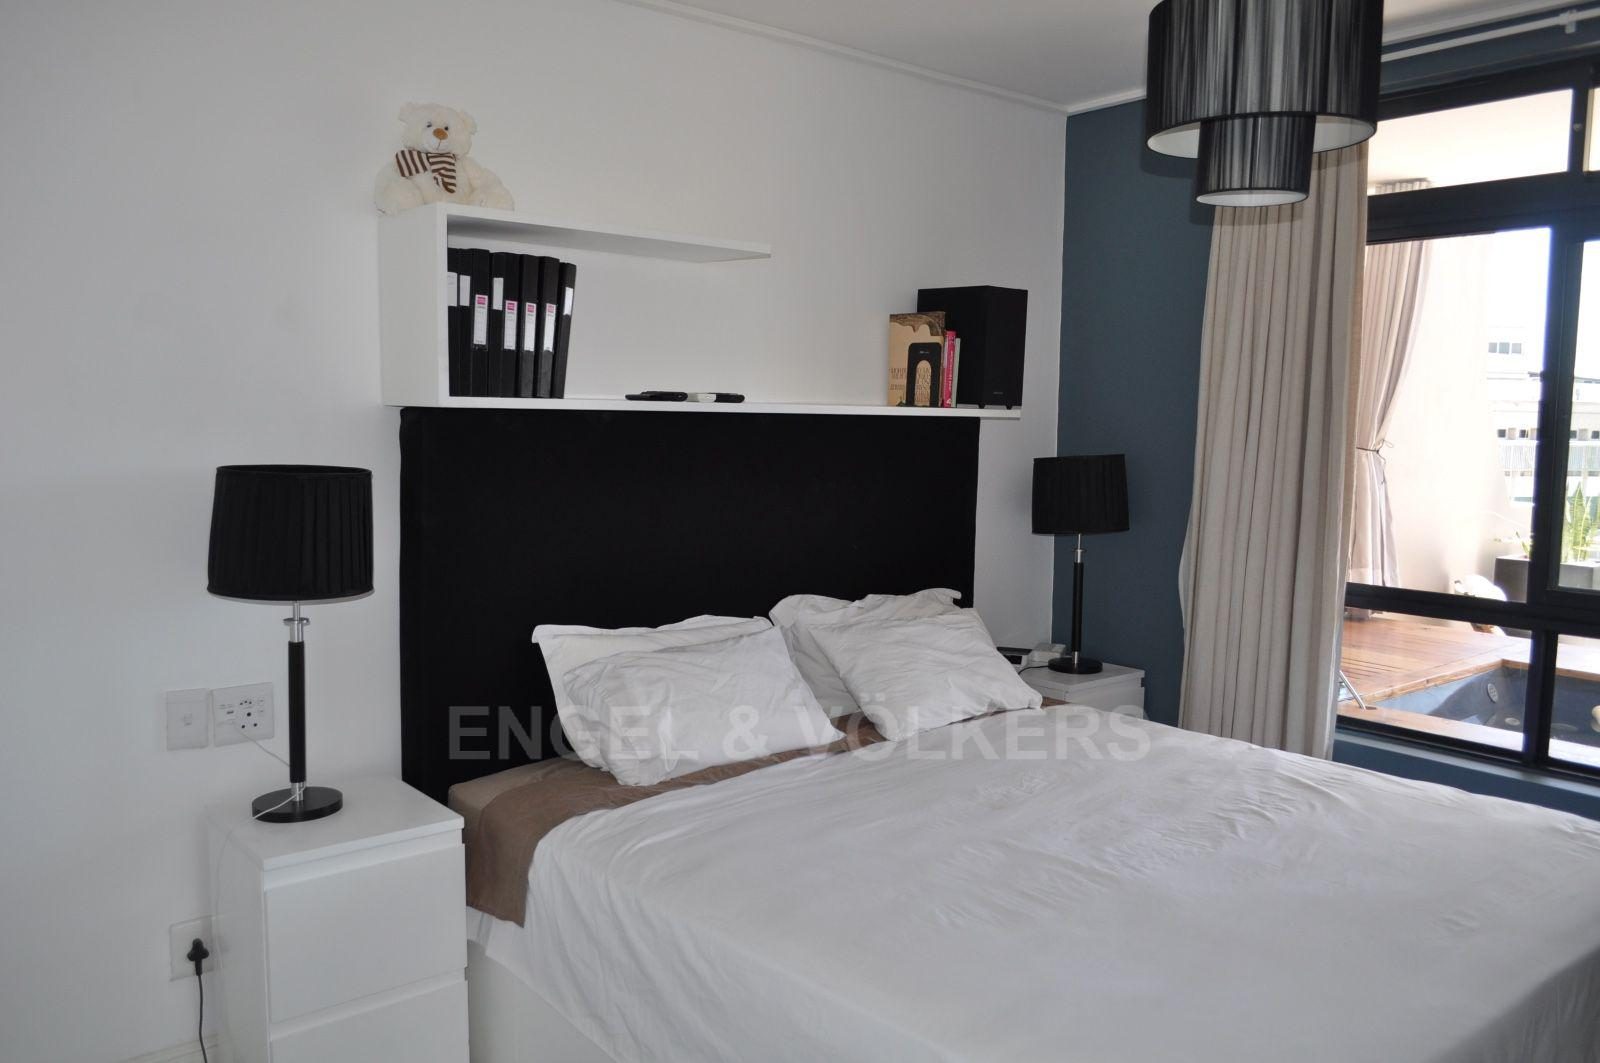 De Waterkant property for sale. Ref No: 13450081. Picture no 9